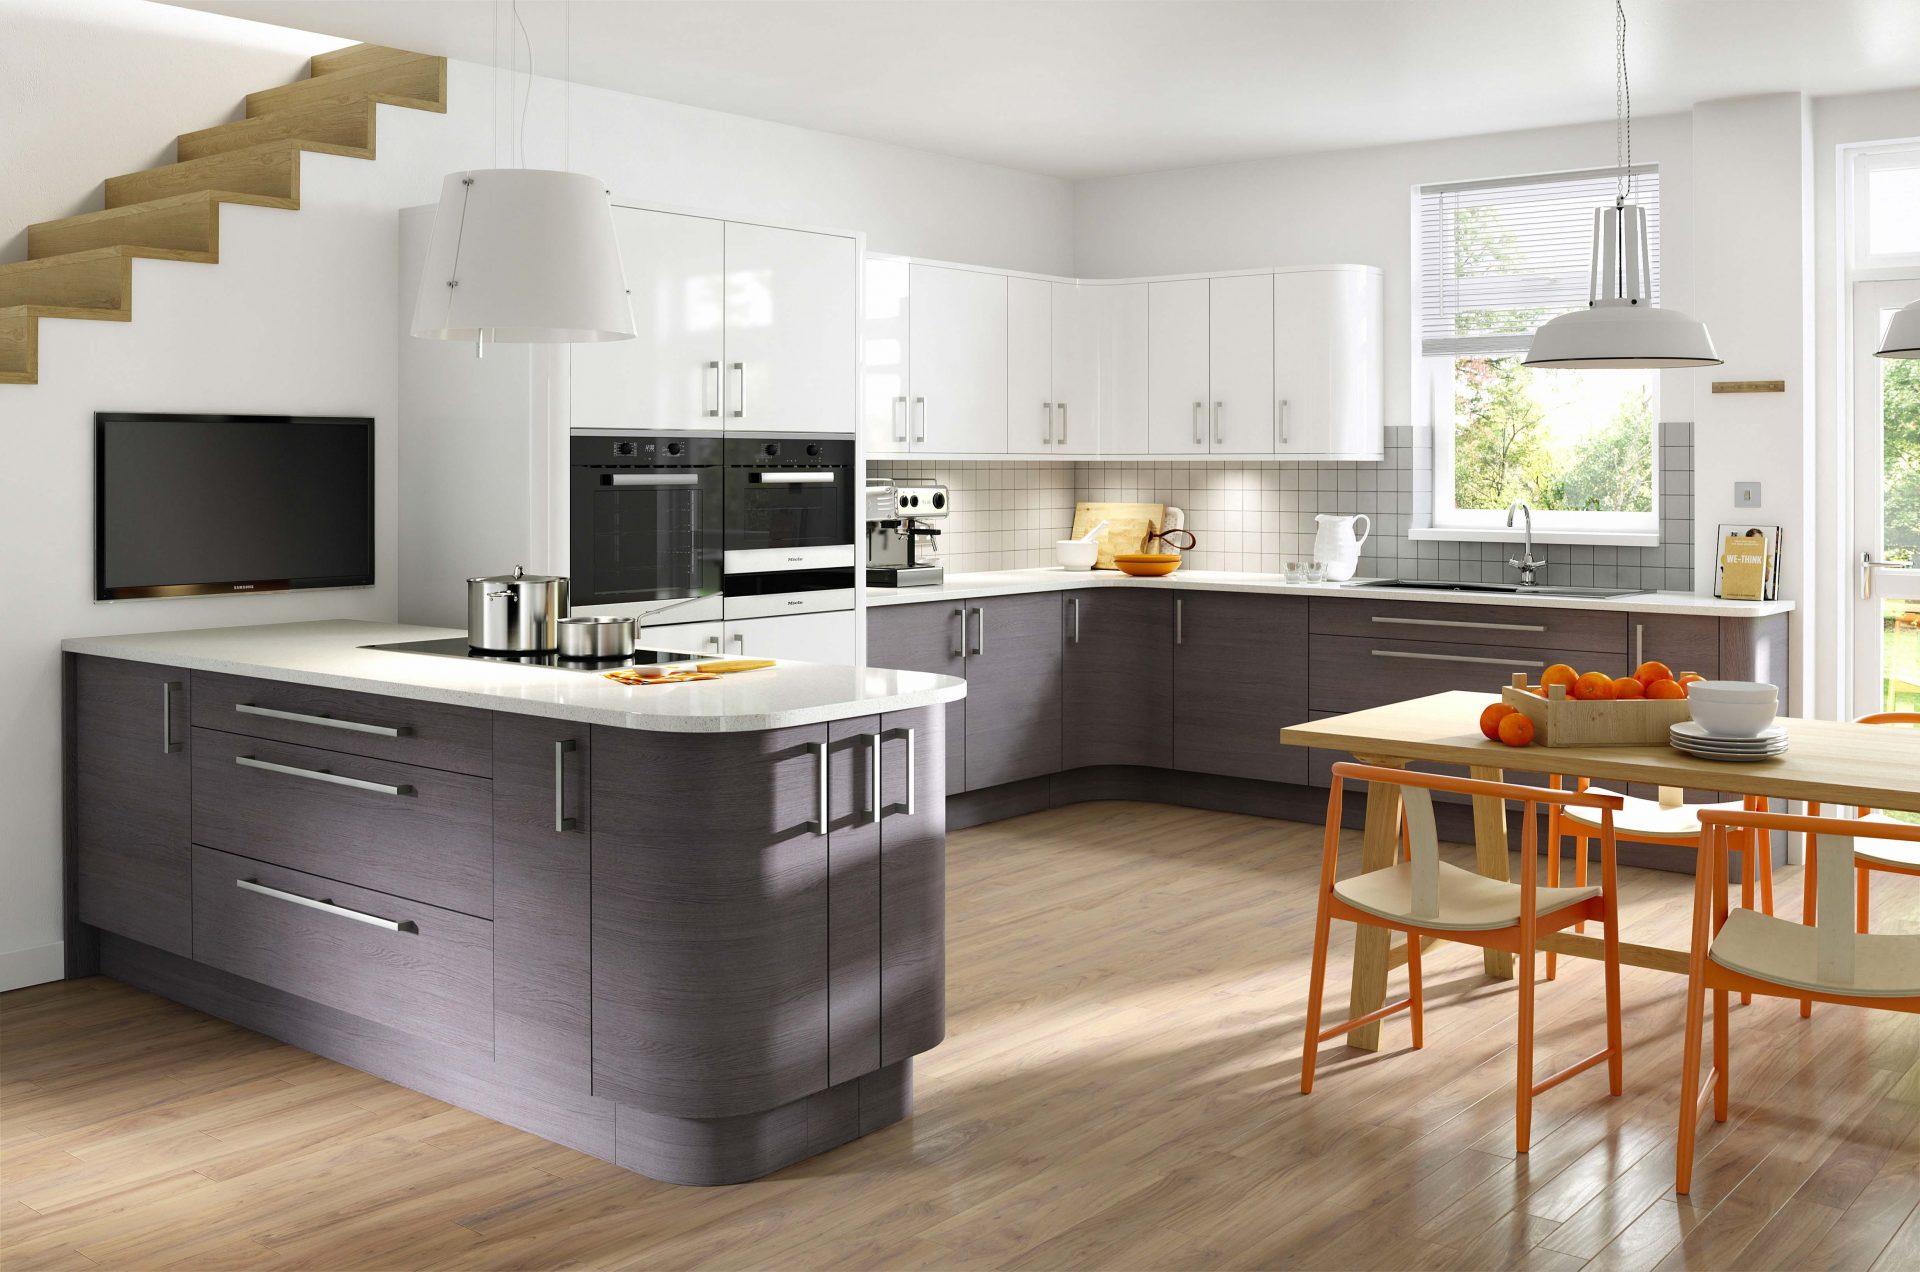 Kitchens Bournemouth